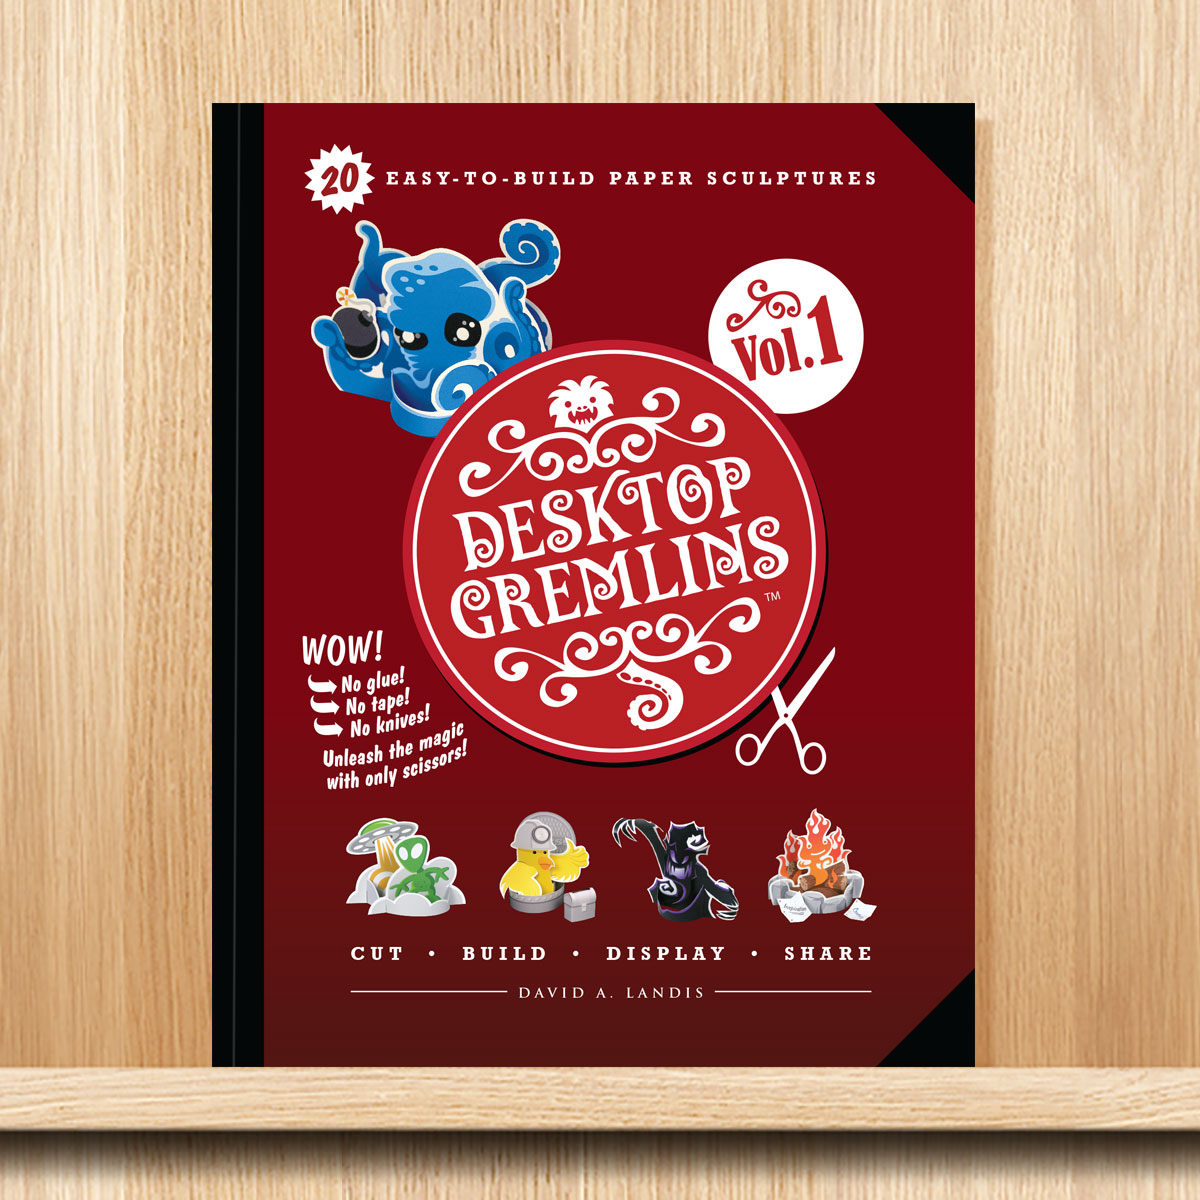 Desktop Gremlins Book by Landis Productions